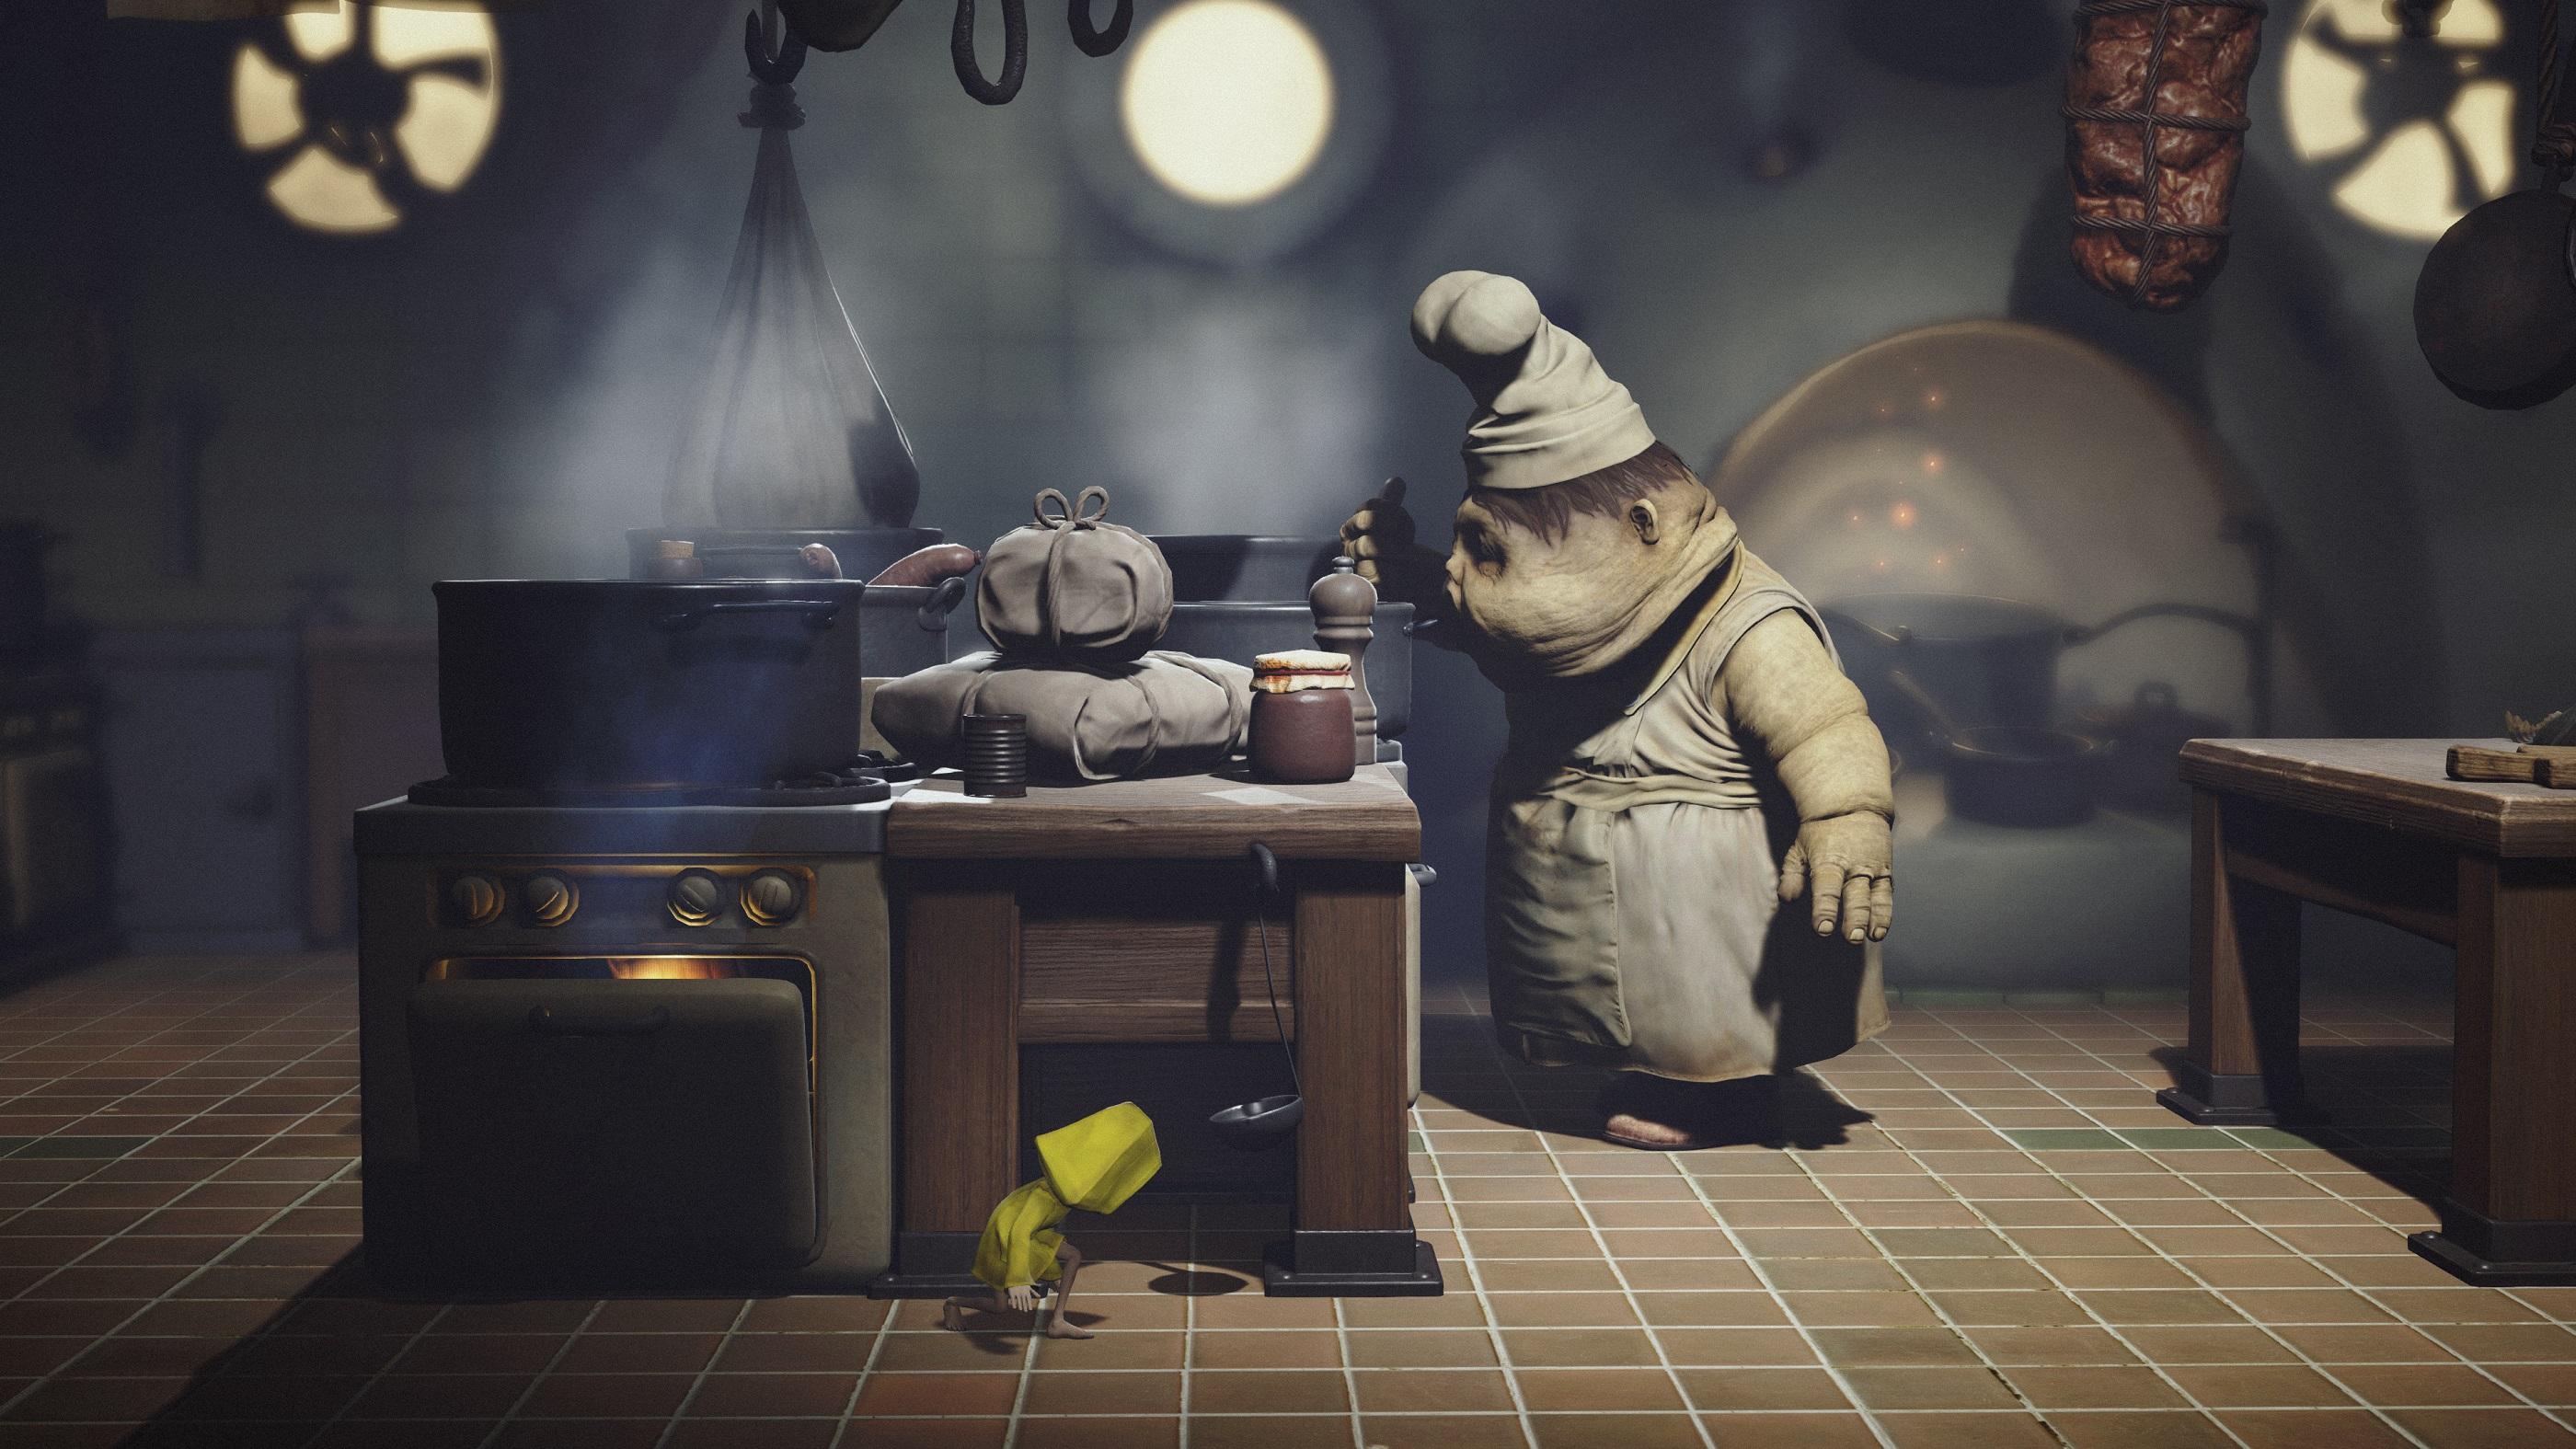 Little Nightmares The Kitchen